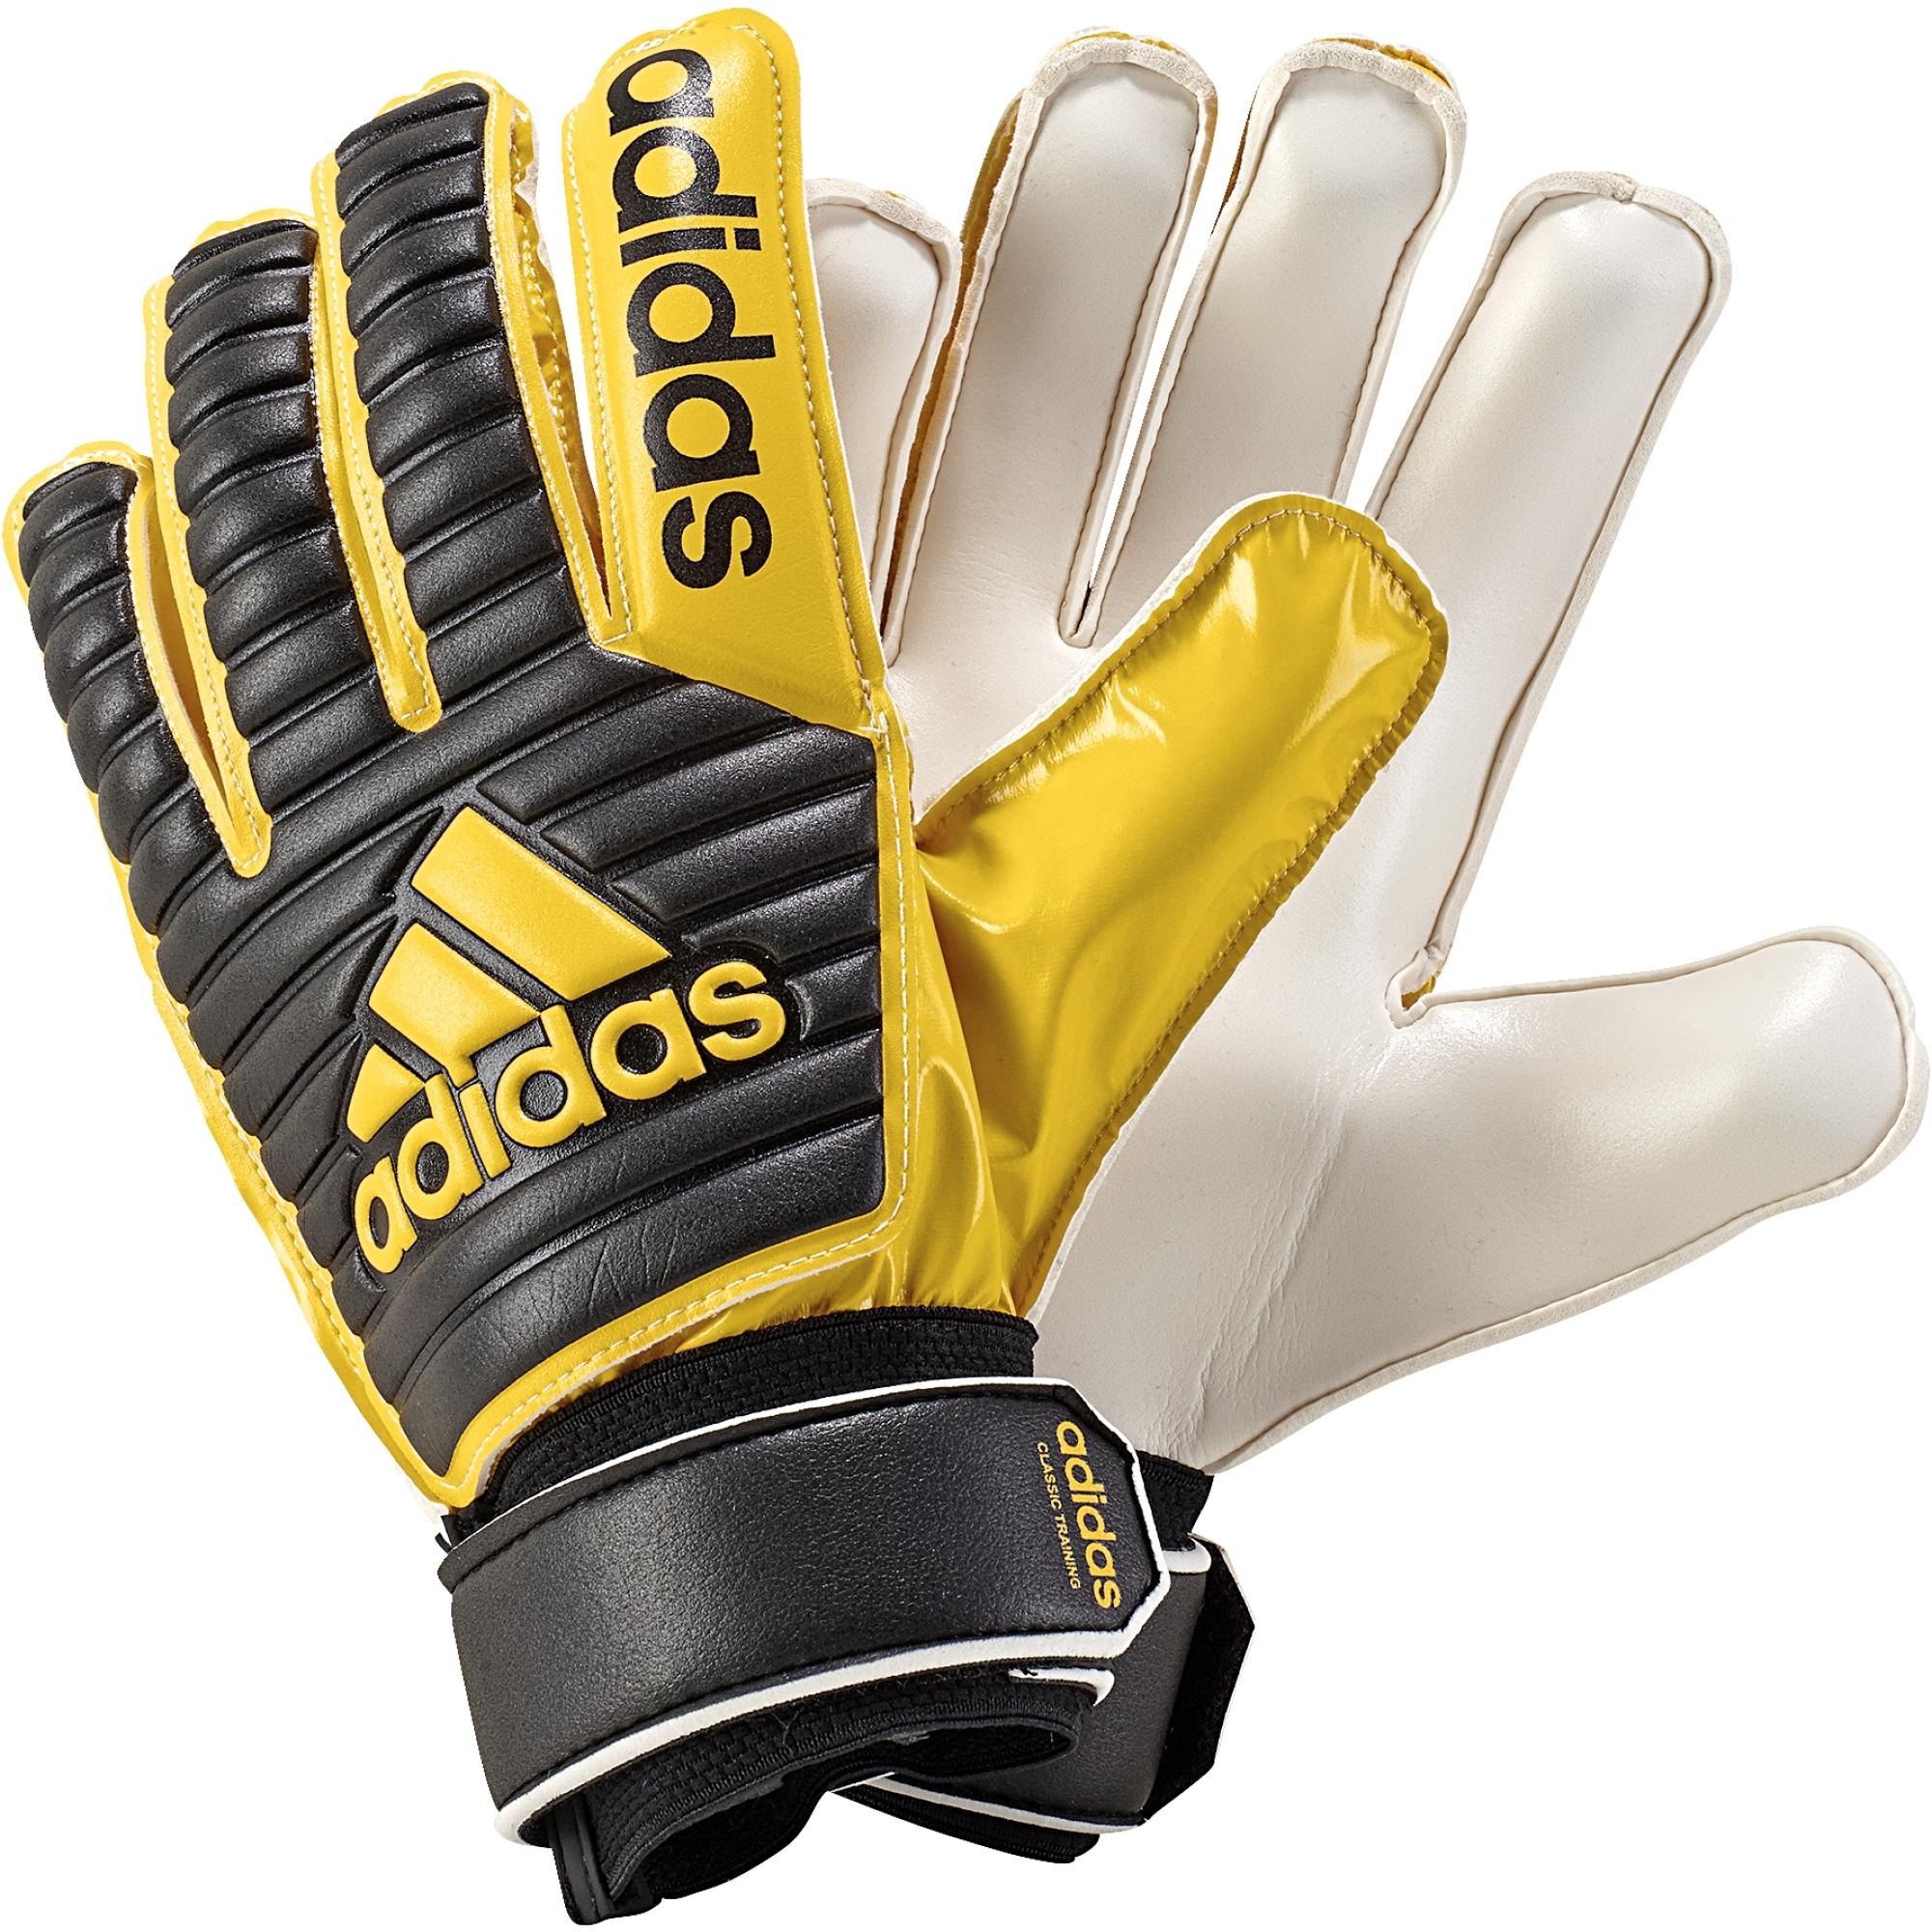 ADIDAS brankářské rukavice Classic Training